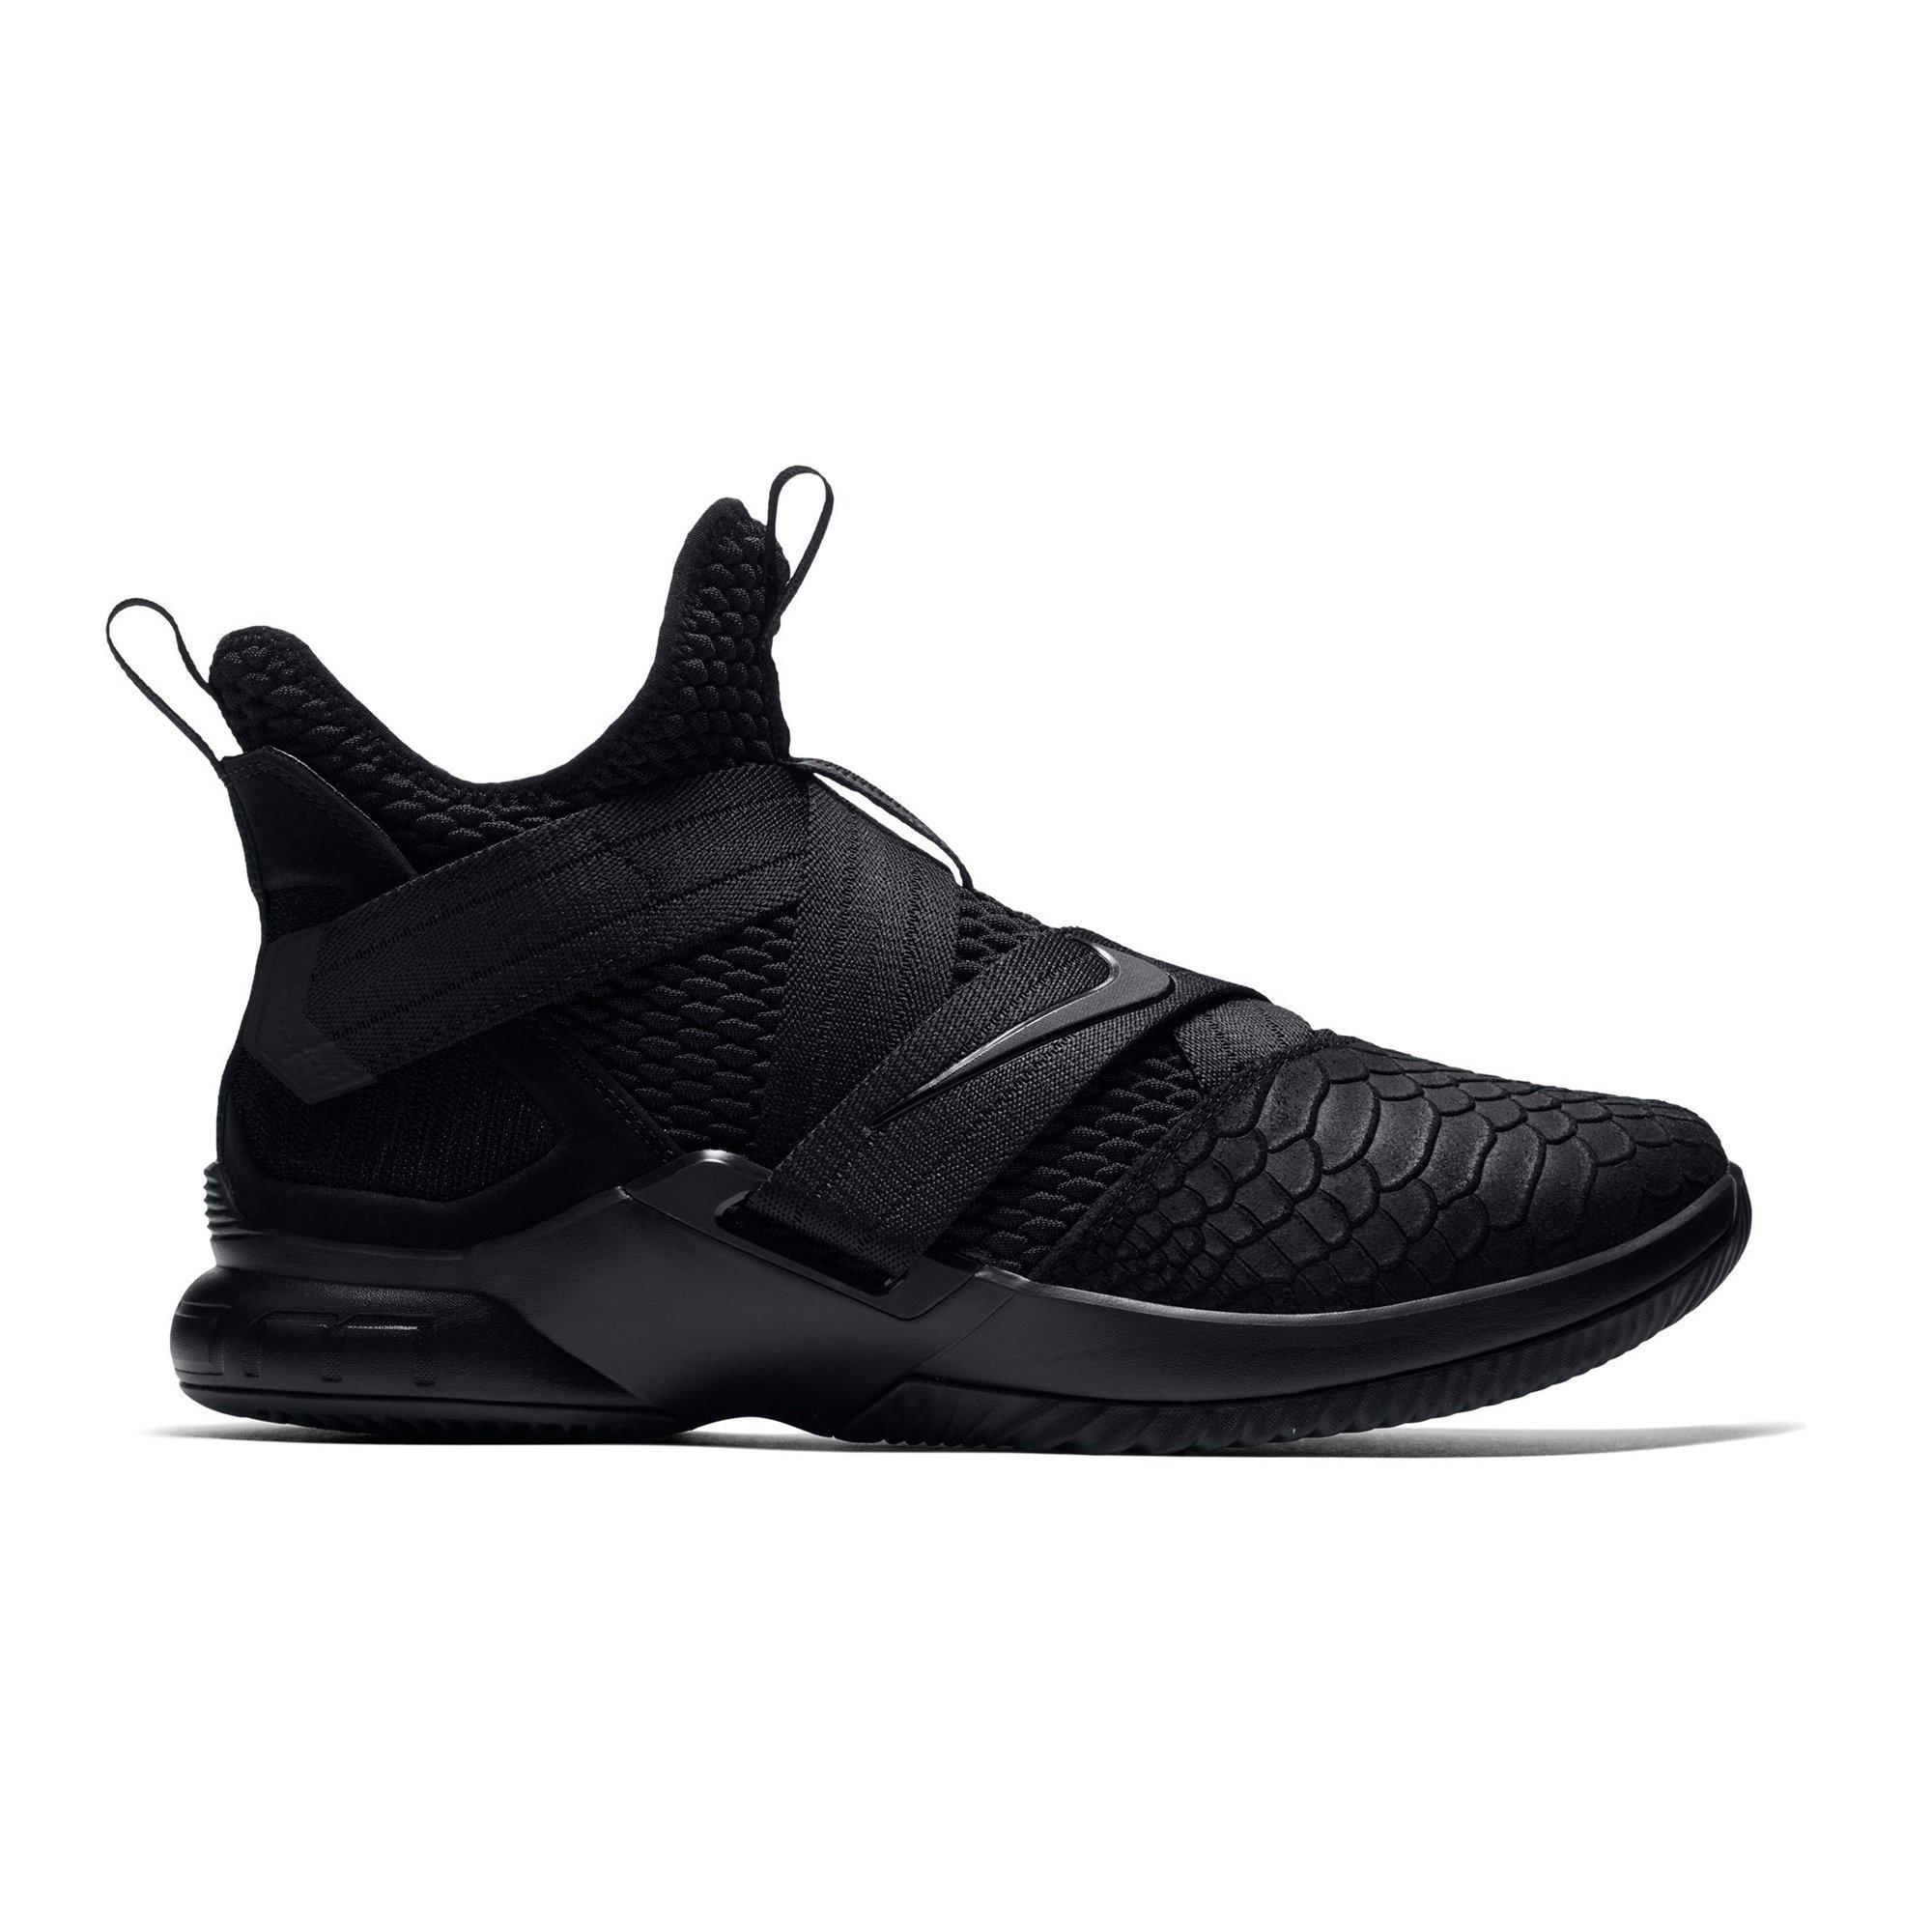 Nike LeBron Soldier XII SFG \